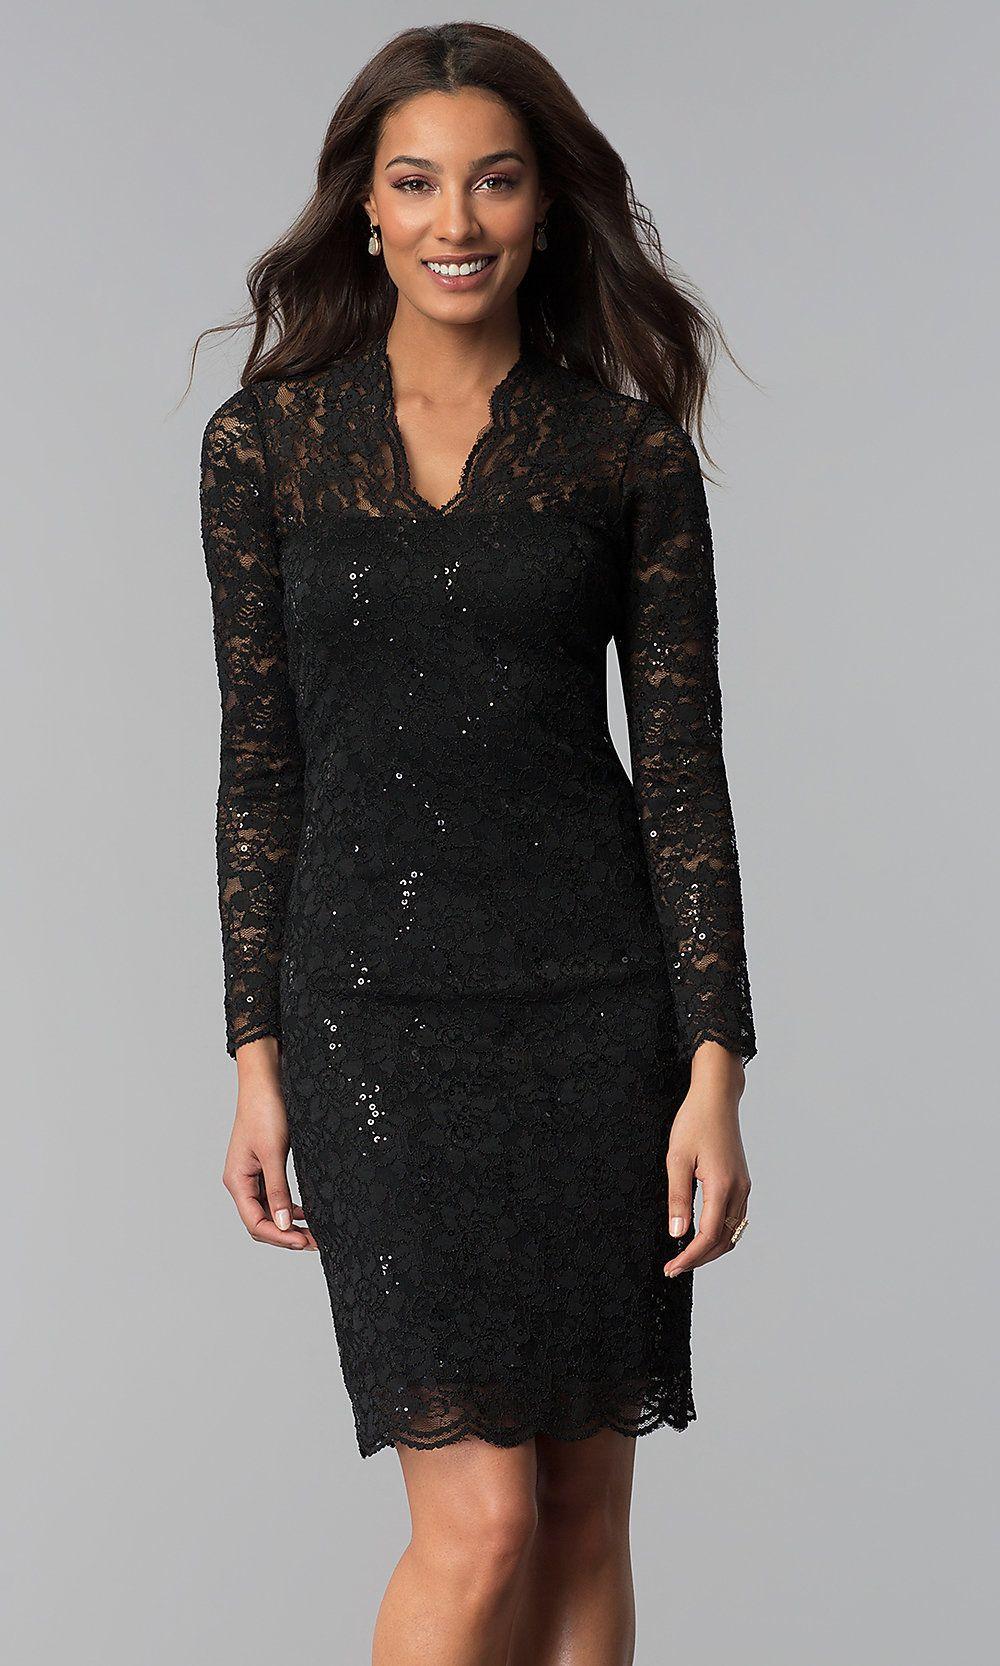 Lace Knee Length Sequin Wedding Guest Dress Promgirl Lace Wedding Guest Dress Little Black Dress Outfit Wedding Guest Dress [ 1666 x 1000 Pixel ]